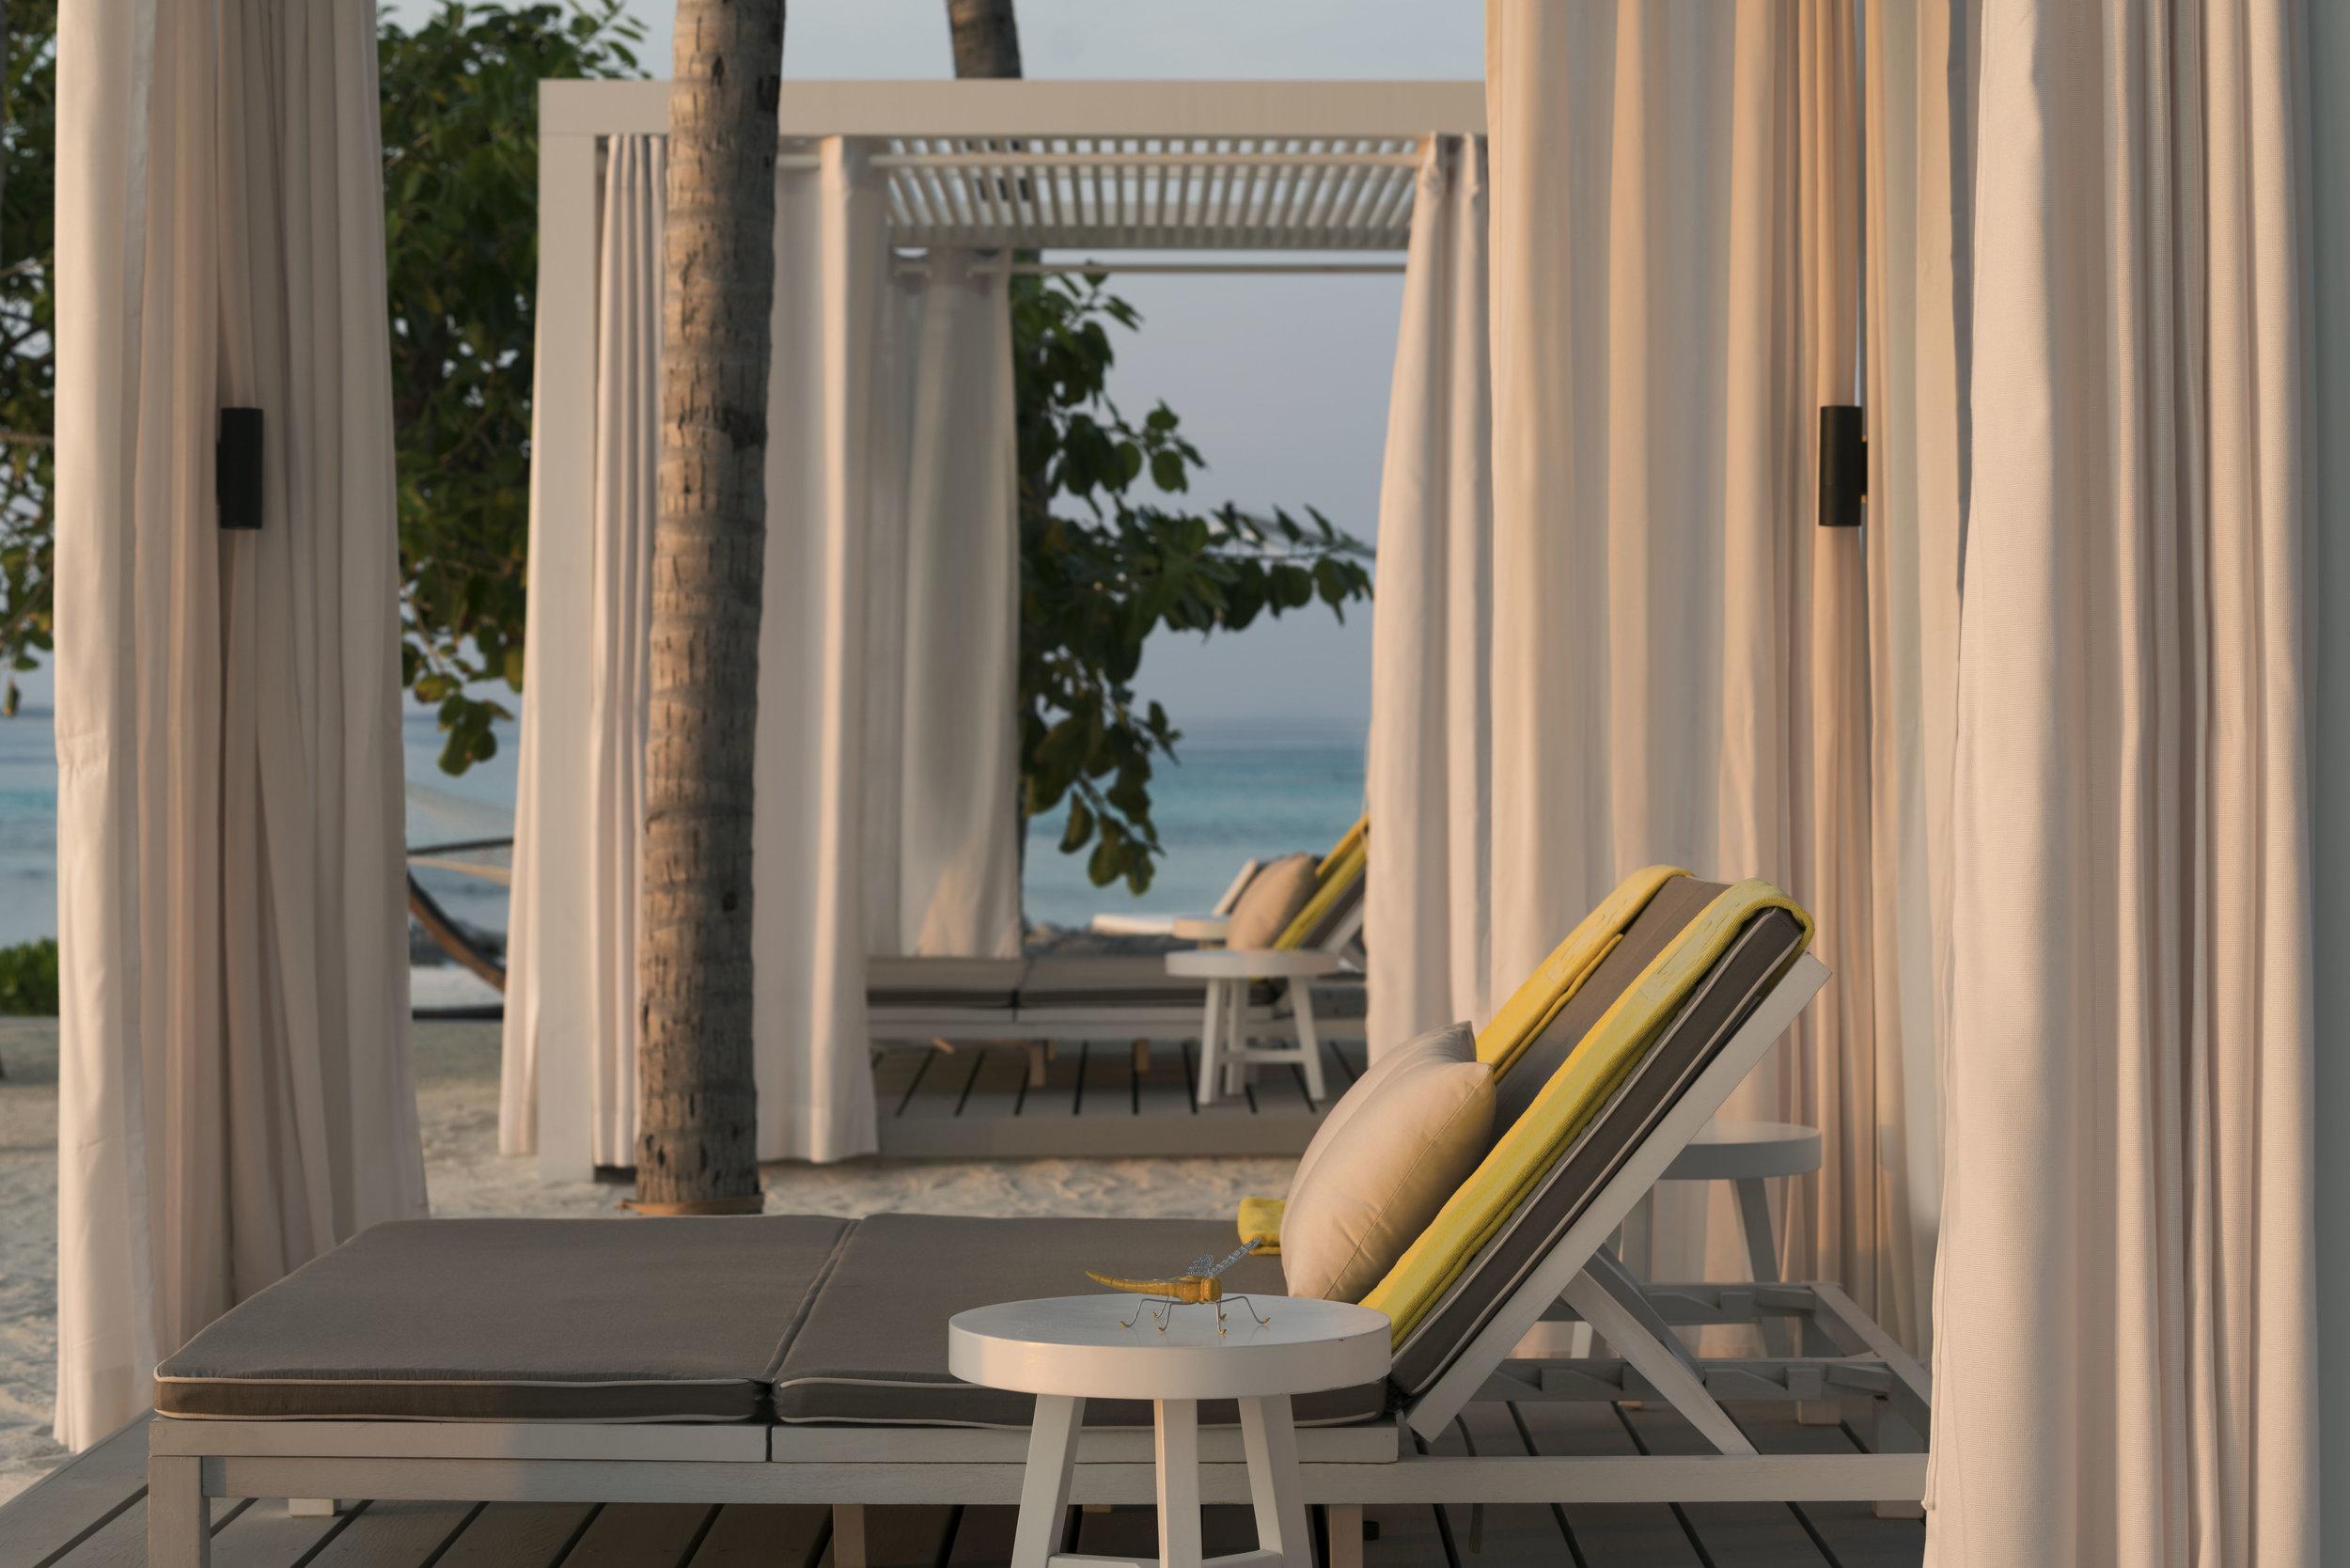 20180516045422_3-2-the-white-bar-beach-club-f-nannini-cba6900.jpg